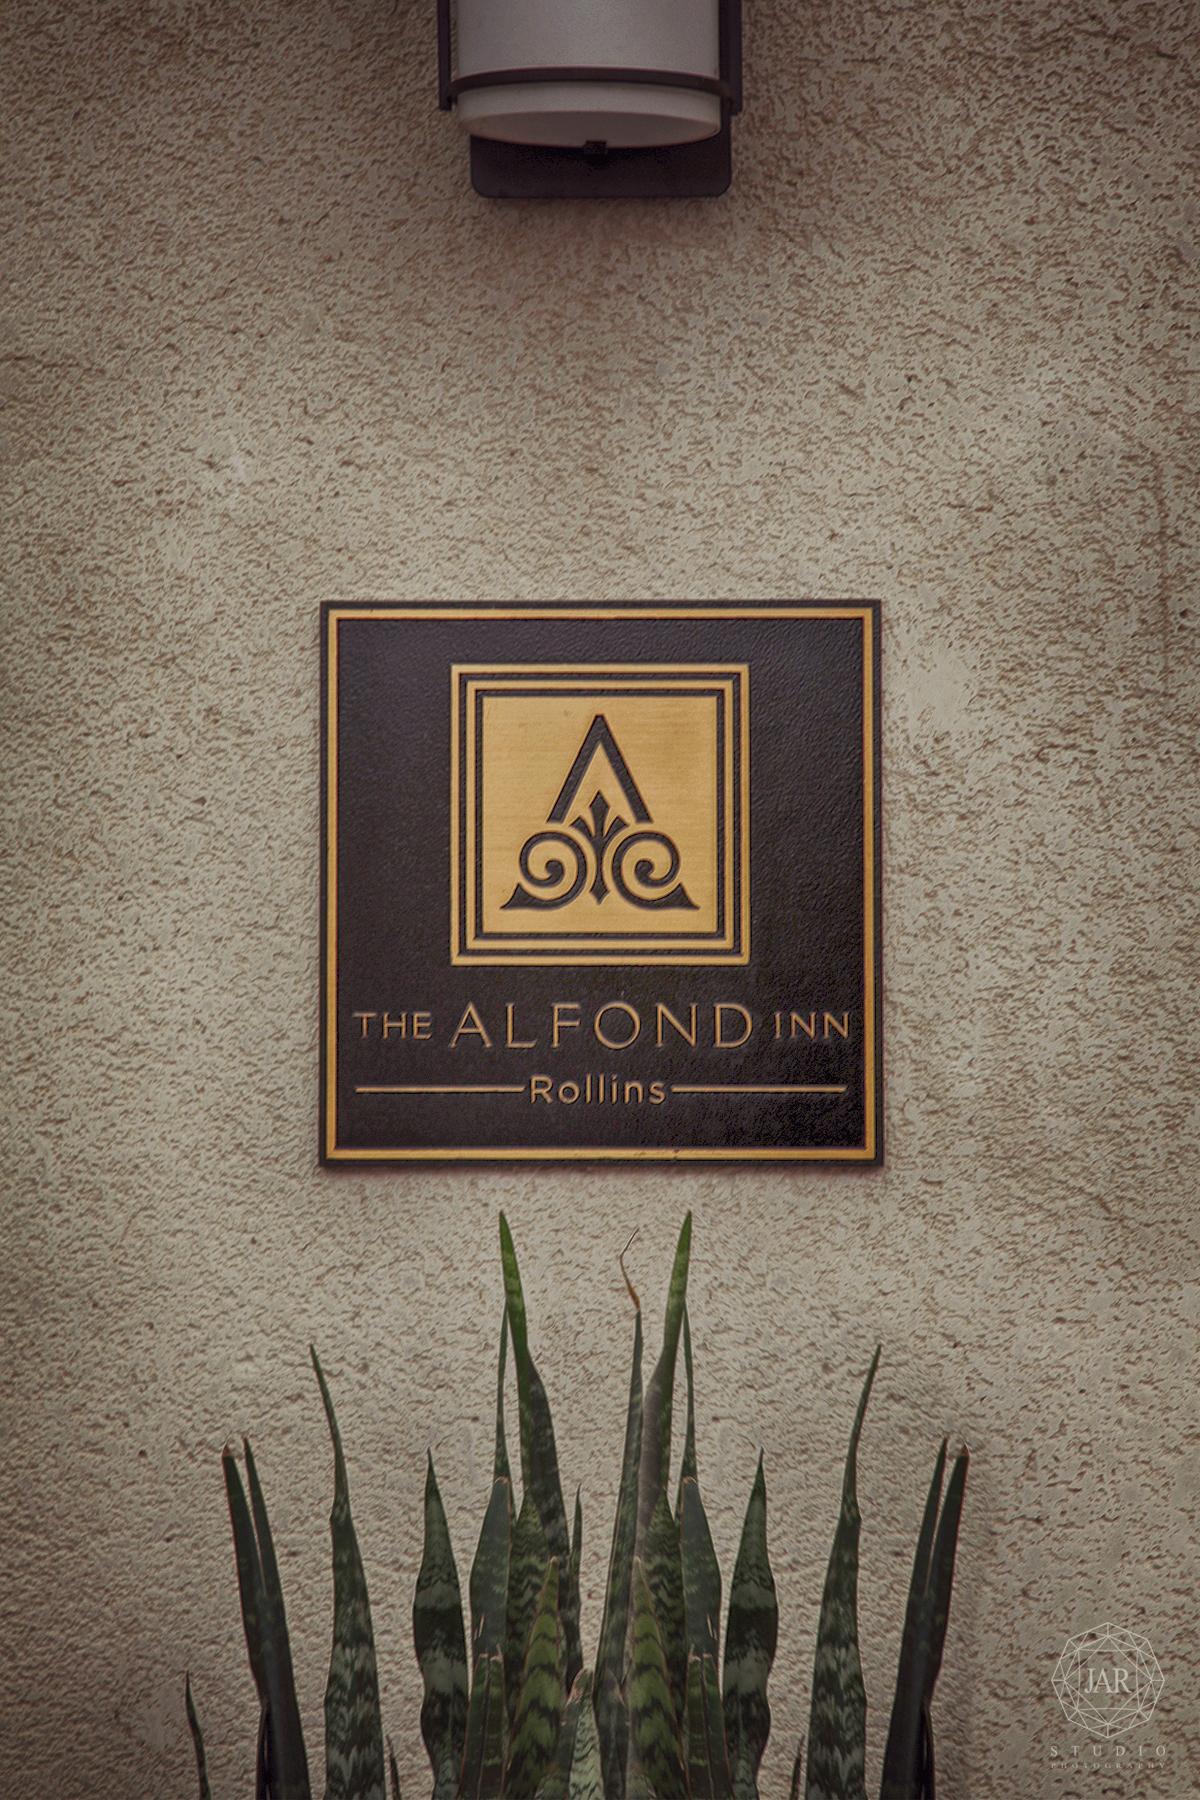 01-the-alfond-inn-winter-park-rollings-wedding-events-jarstudio.JPG